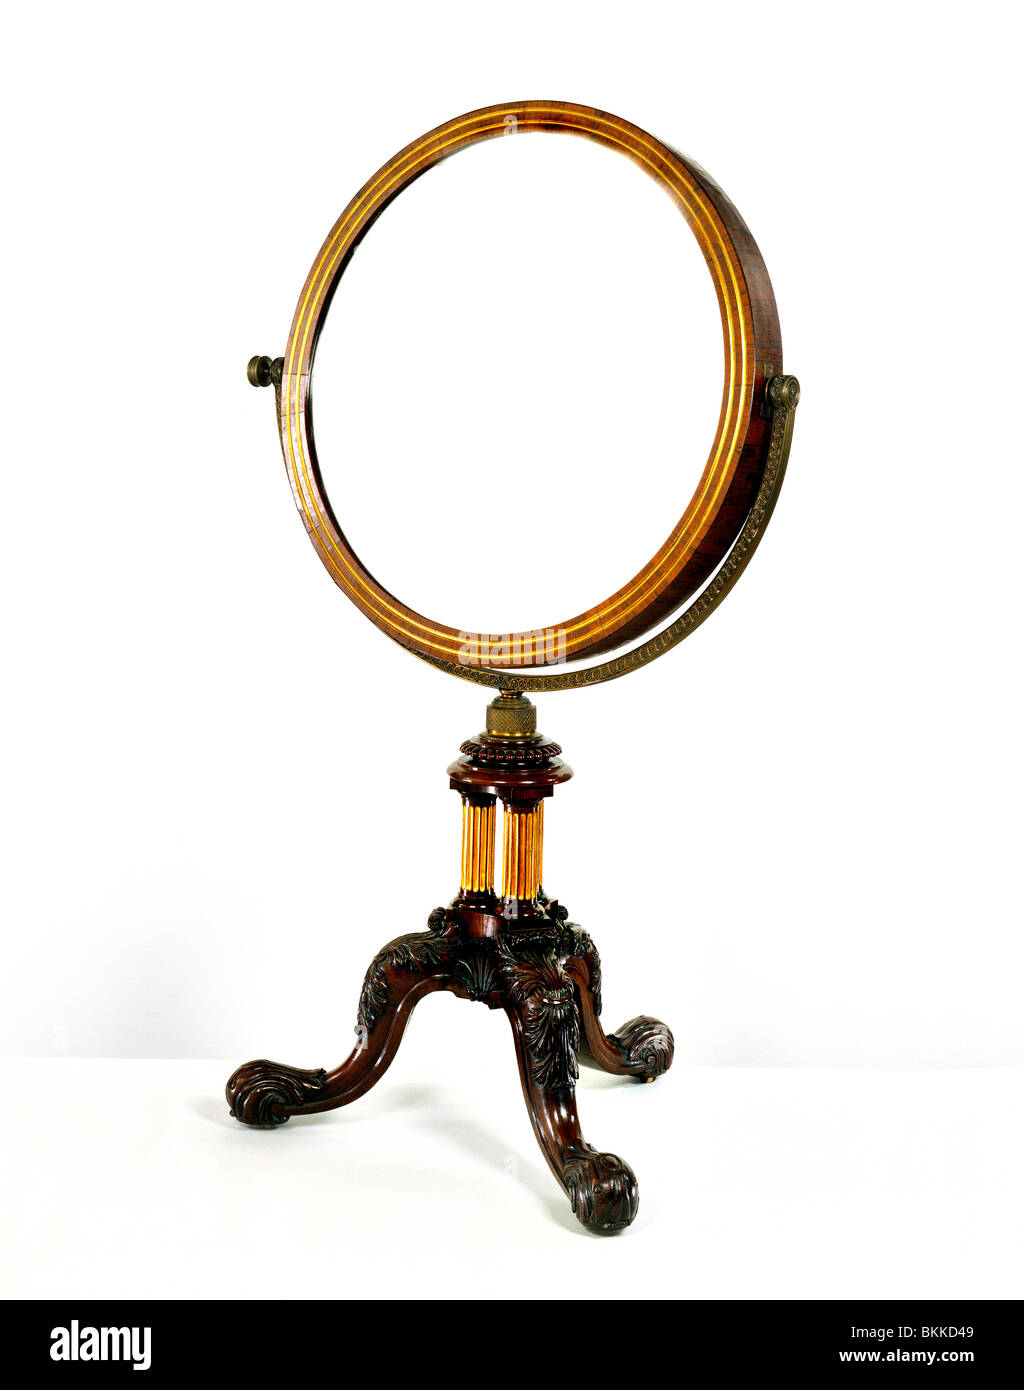 Concave mirror. England, 19th century - Stock Image